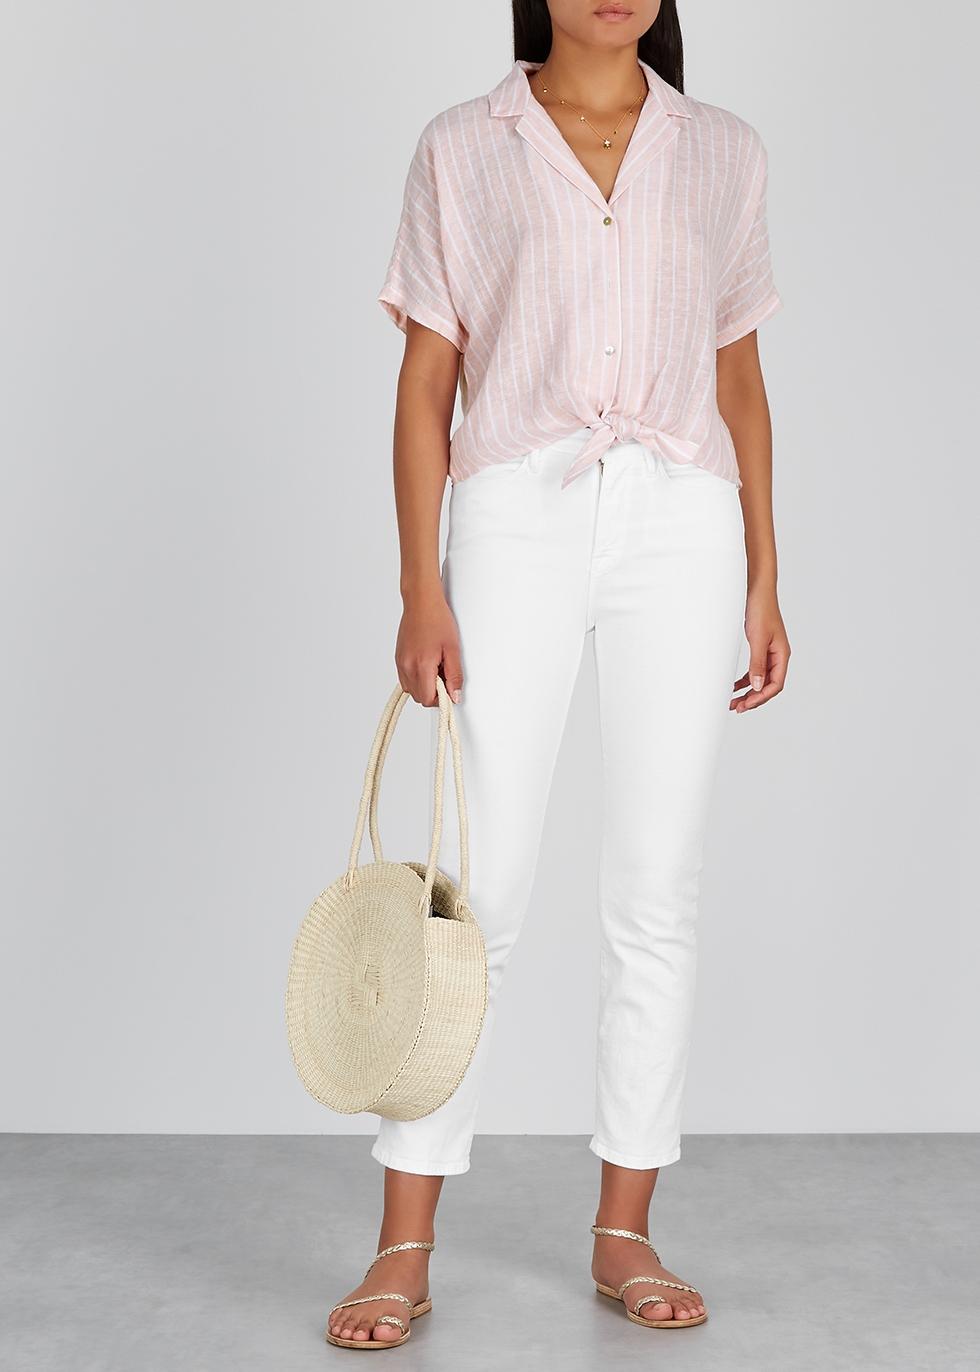 470fed3a Women's Designer Short-Sleeved Tops - Harvey Nichols